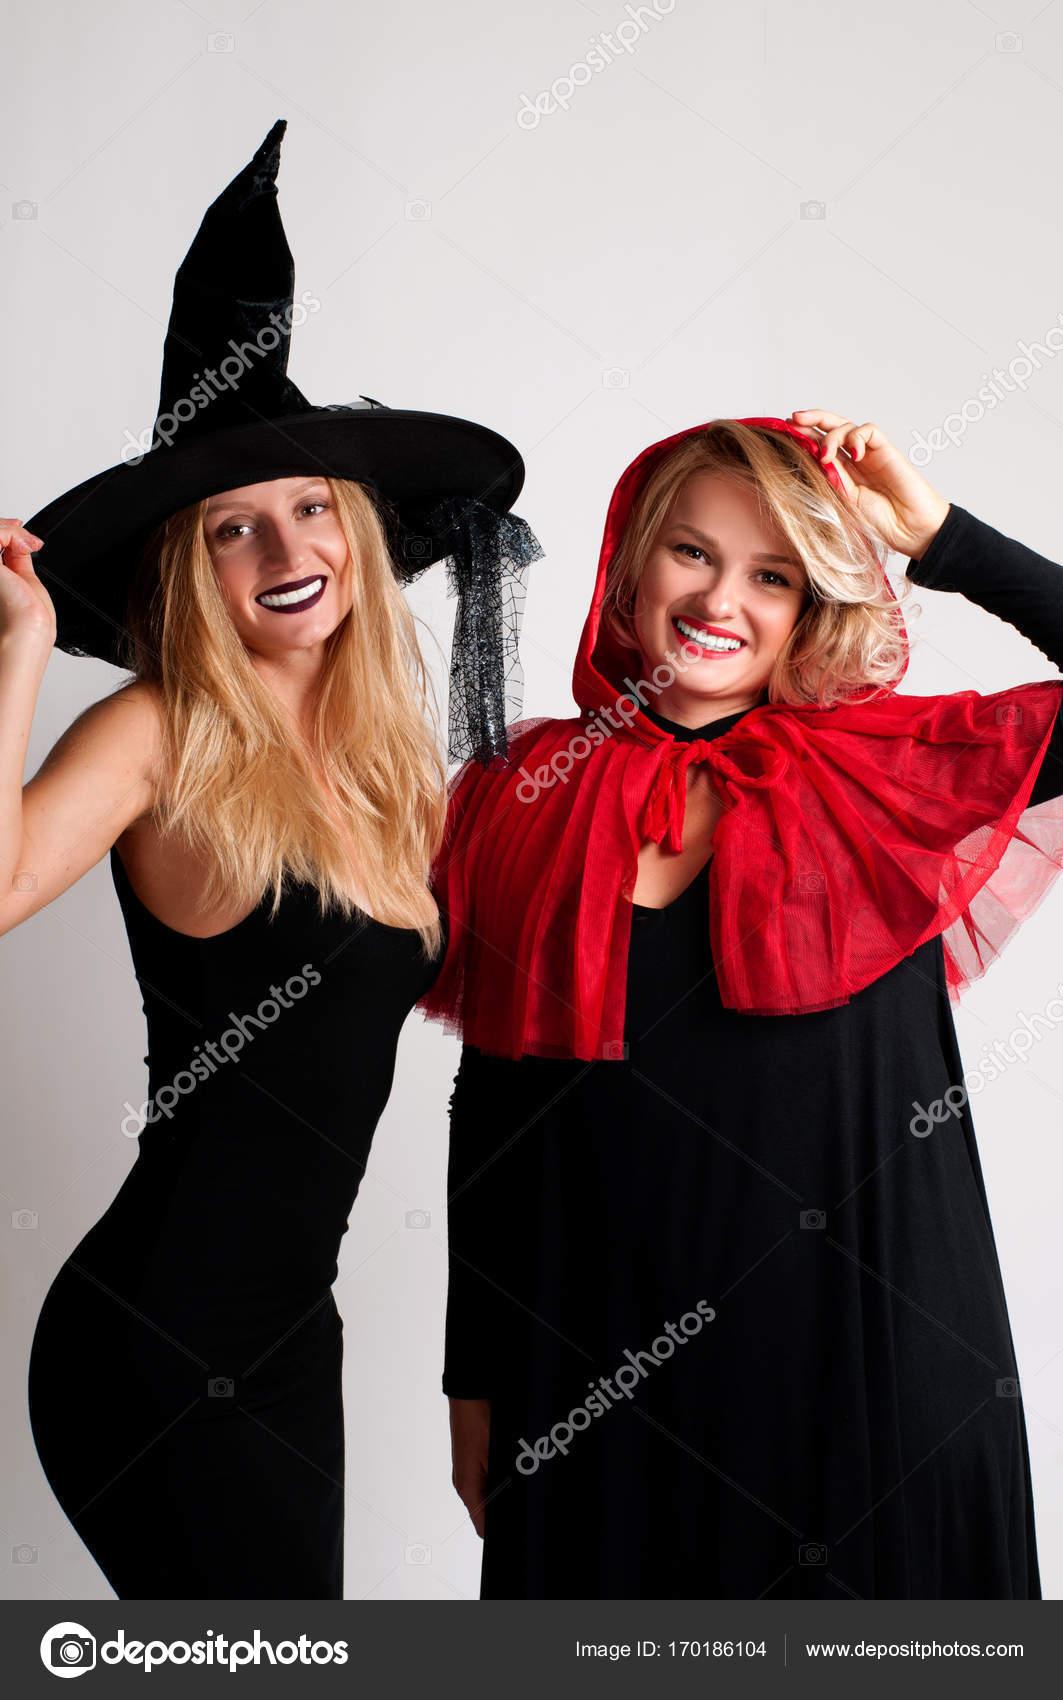 Образ девушек на хэллоуин